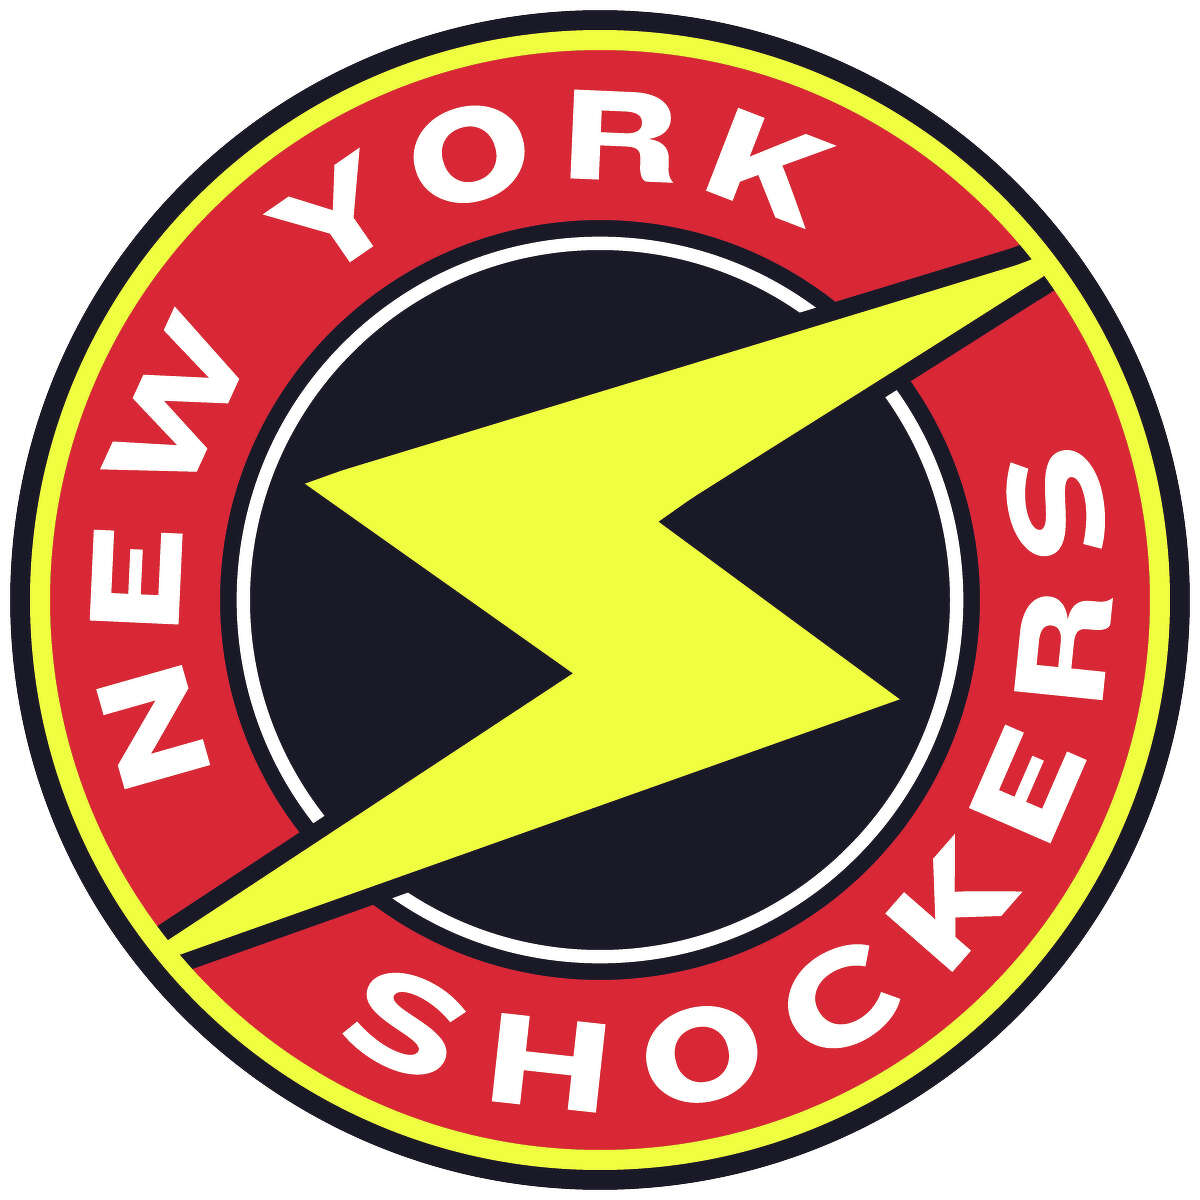 New York Shockers logo.